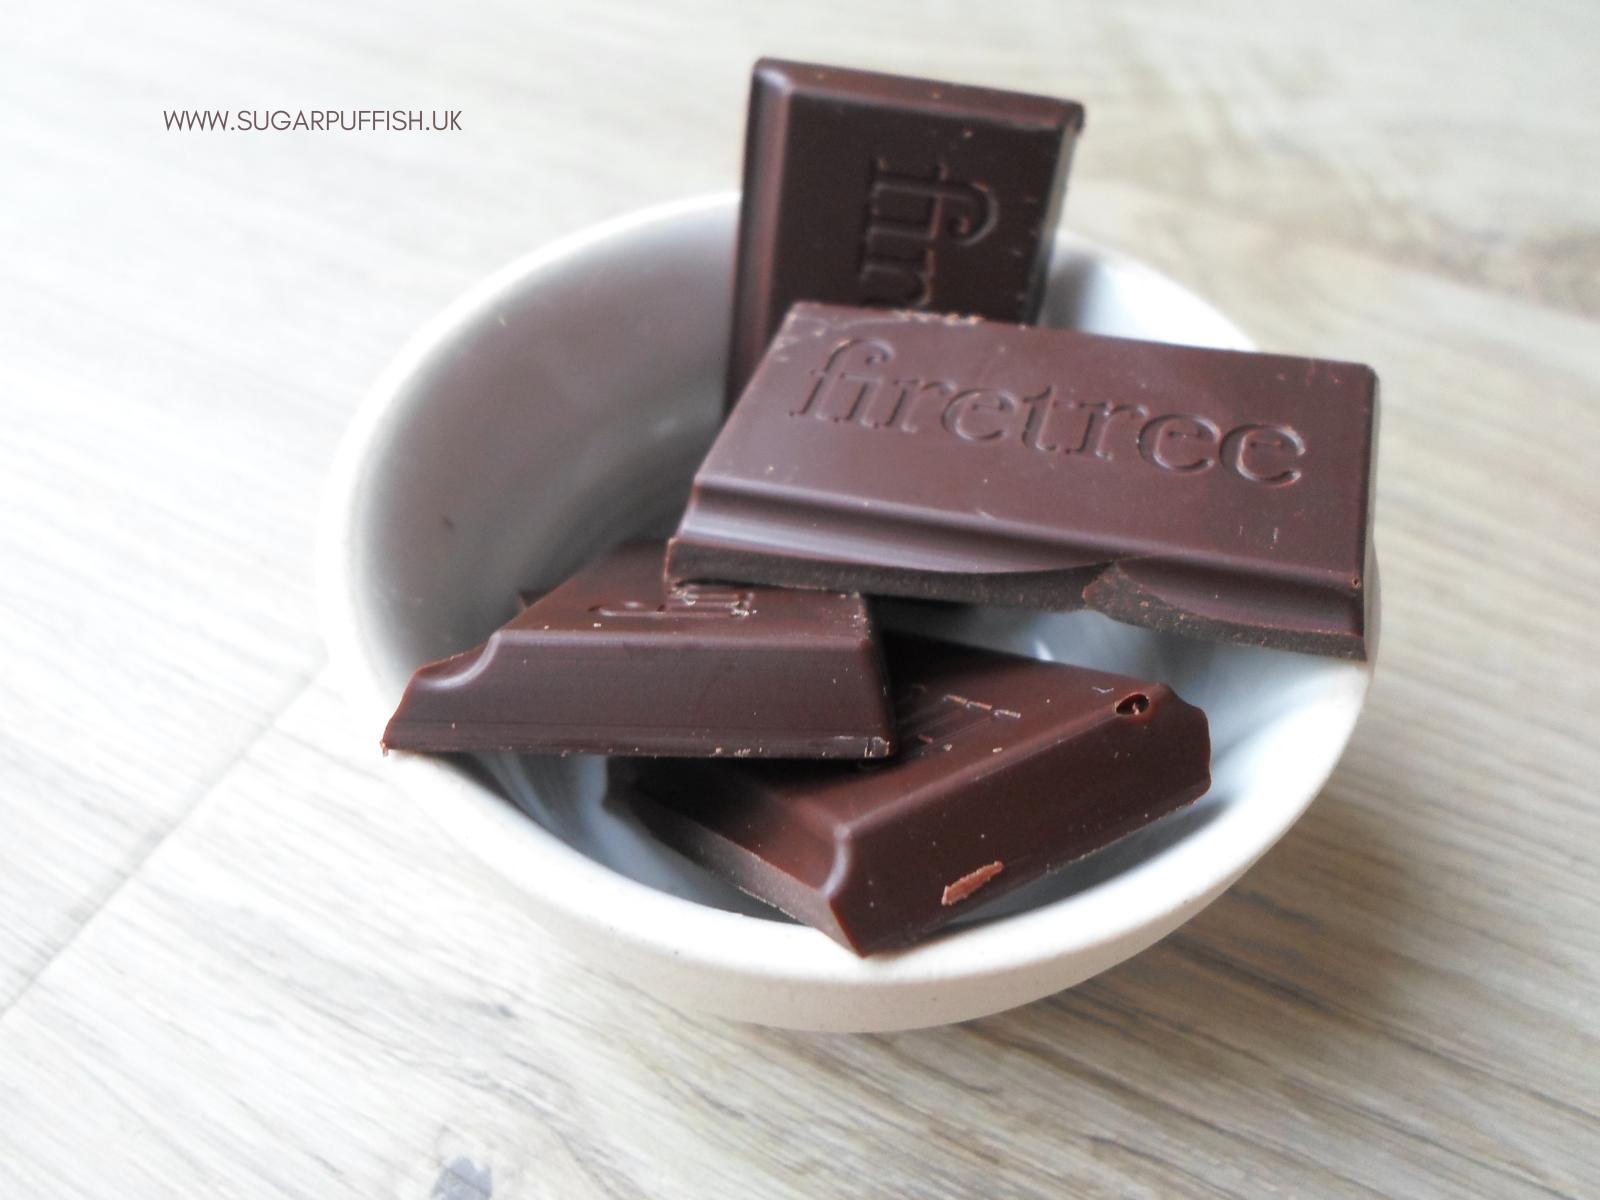 Firetree Rich Volcanic Chocolate dairy free, nut free and vegan